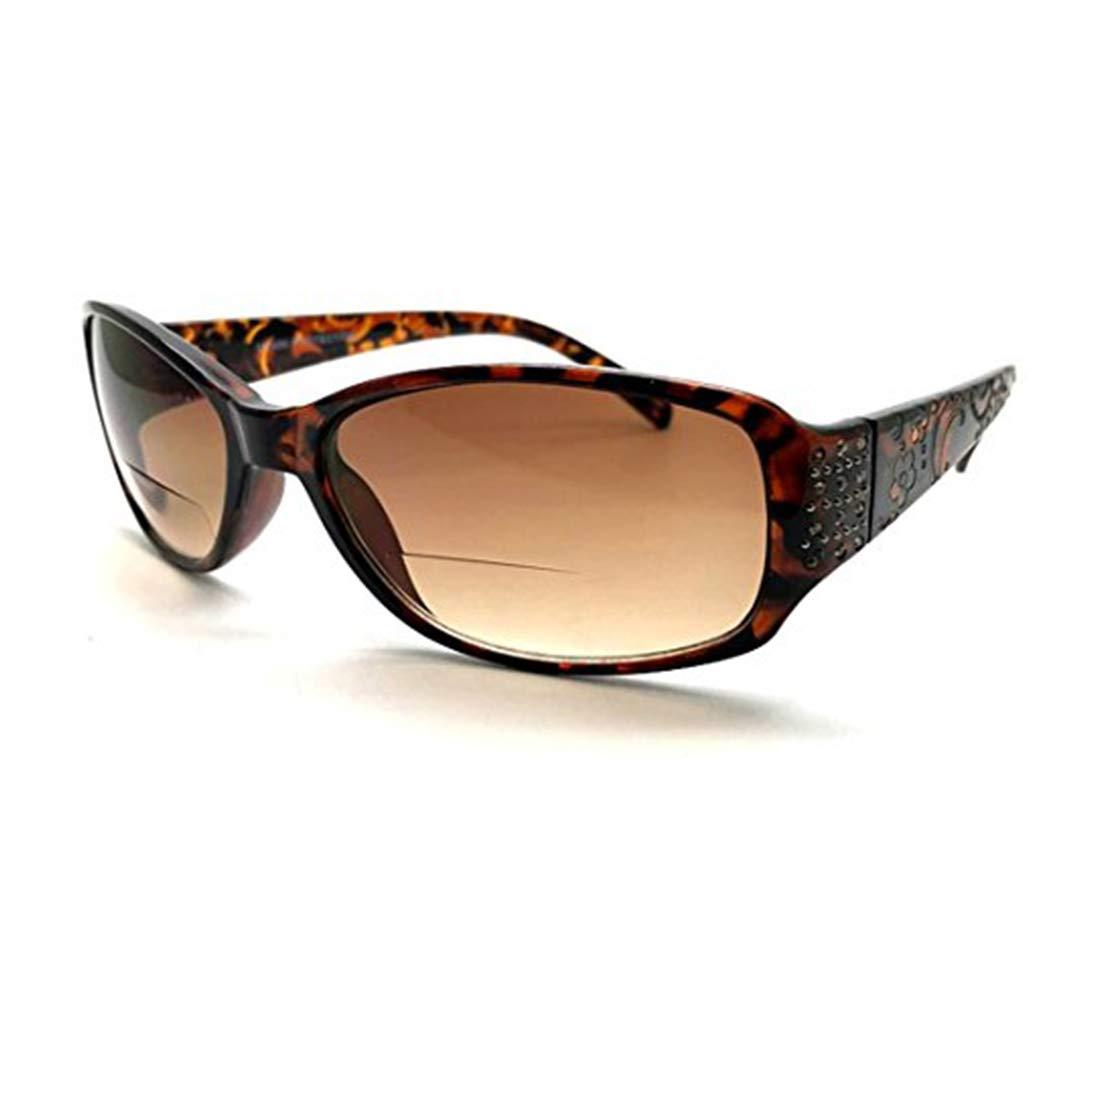 235ea8d2eb26 Amazon.com  Women Bifocal Sun Readers Sunglasses Reading Glasses +1.50 +1.75  +2.00 +2.25 +2.50 +3.00 +3.50 (Black